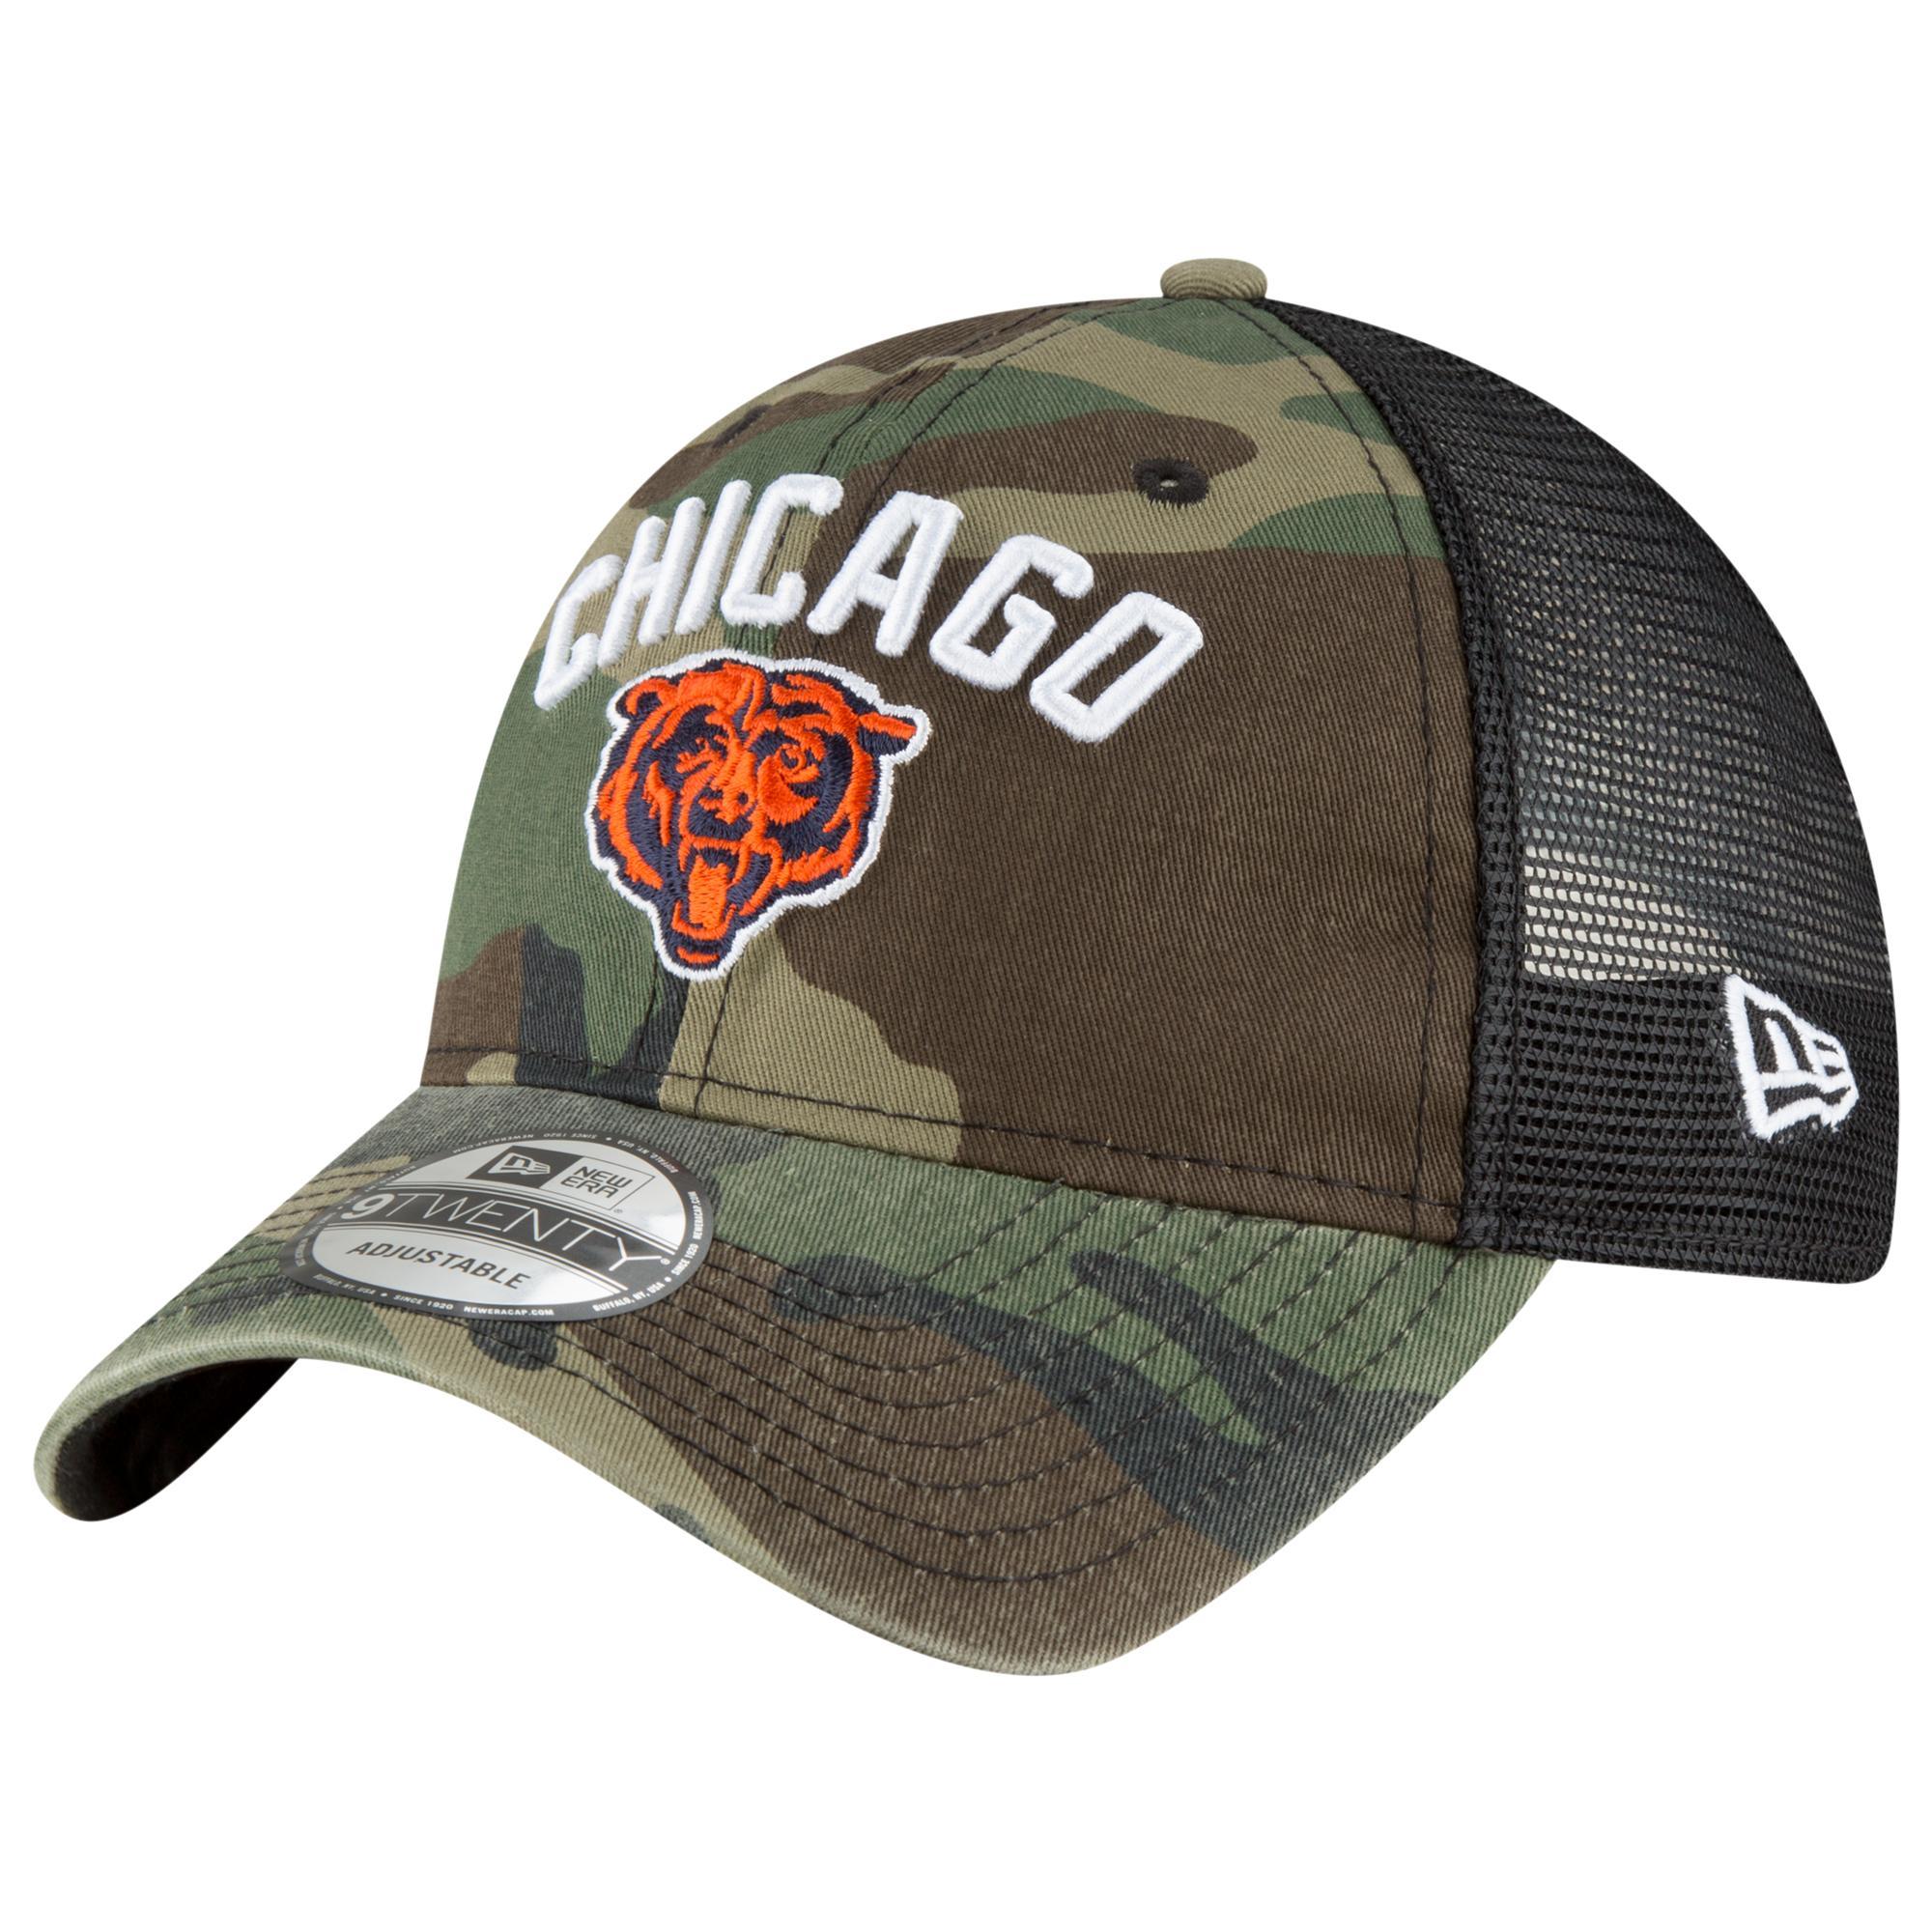 new arrival a6cd8 35e65 KTZ - Green Chicago Bears Nfl 9twenty Rugged Stack Camo Trucker Cap for Men  - Lyst. View fullscreen